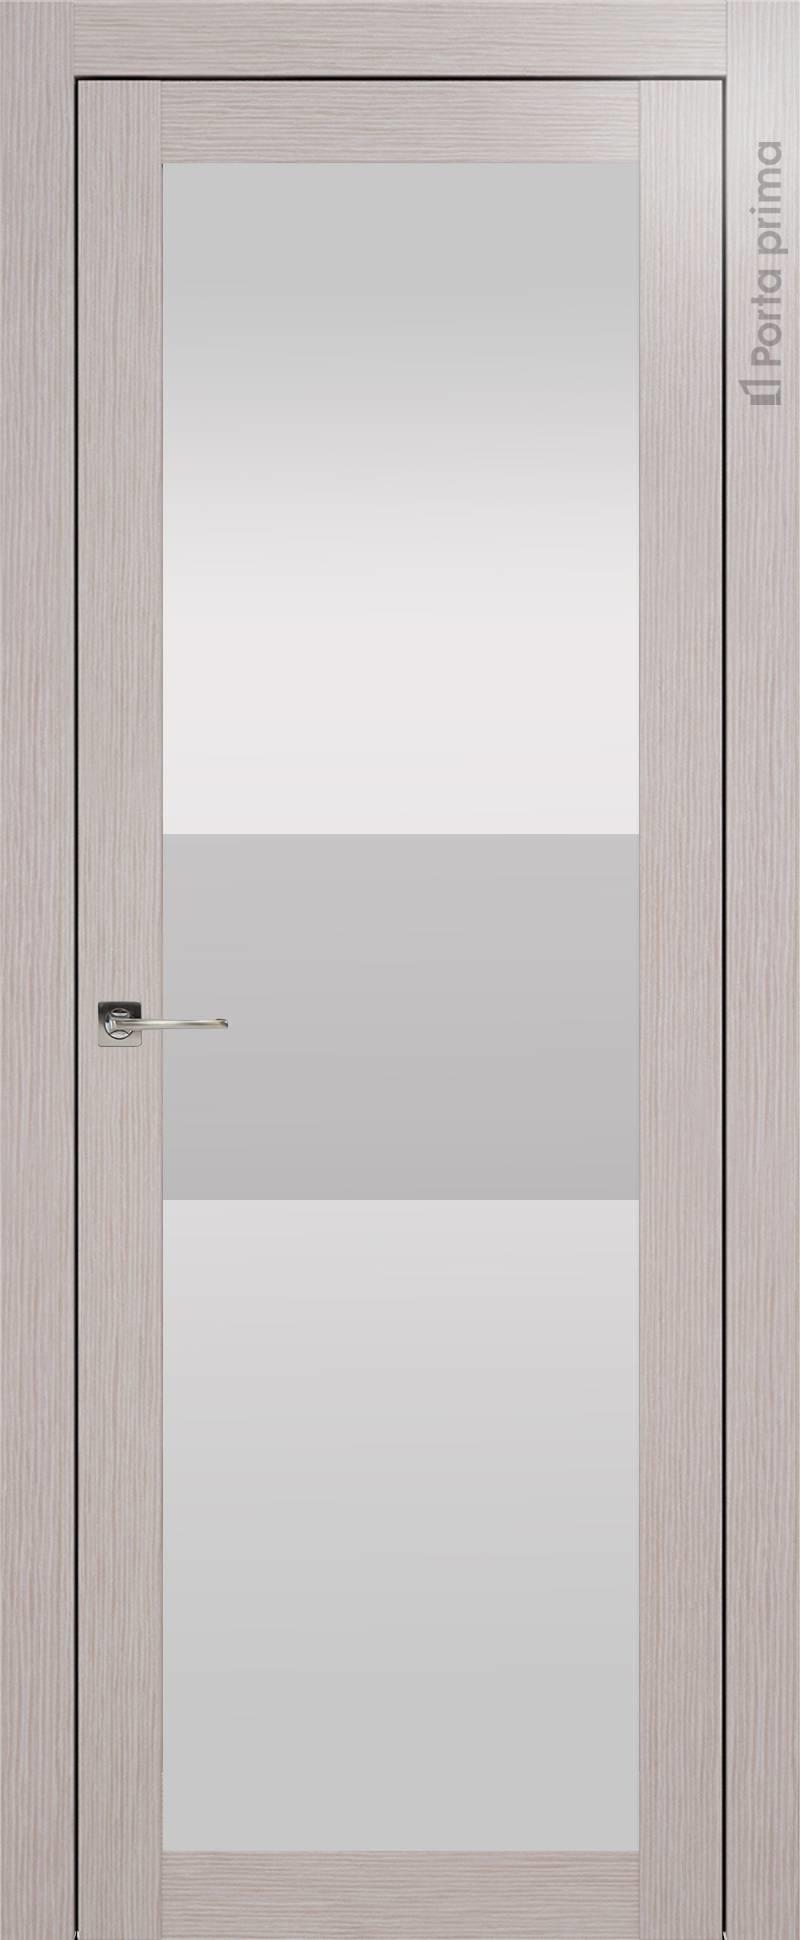 Tivoli З-4 цвет - Дымчатый дуб Со стеклом (ДО)